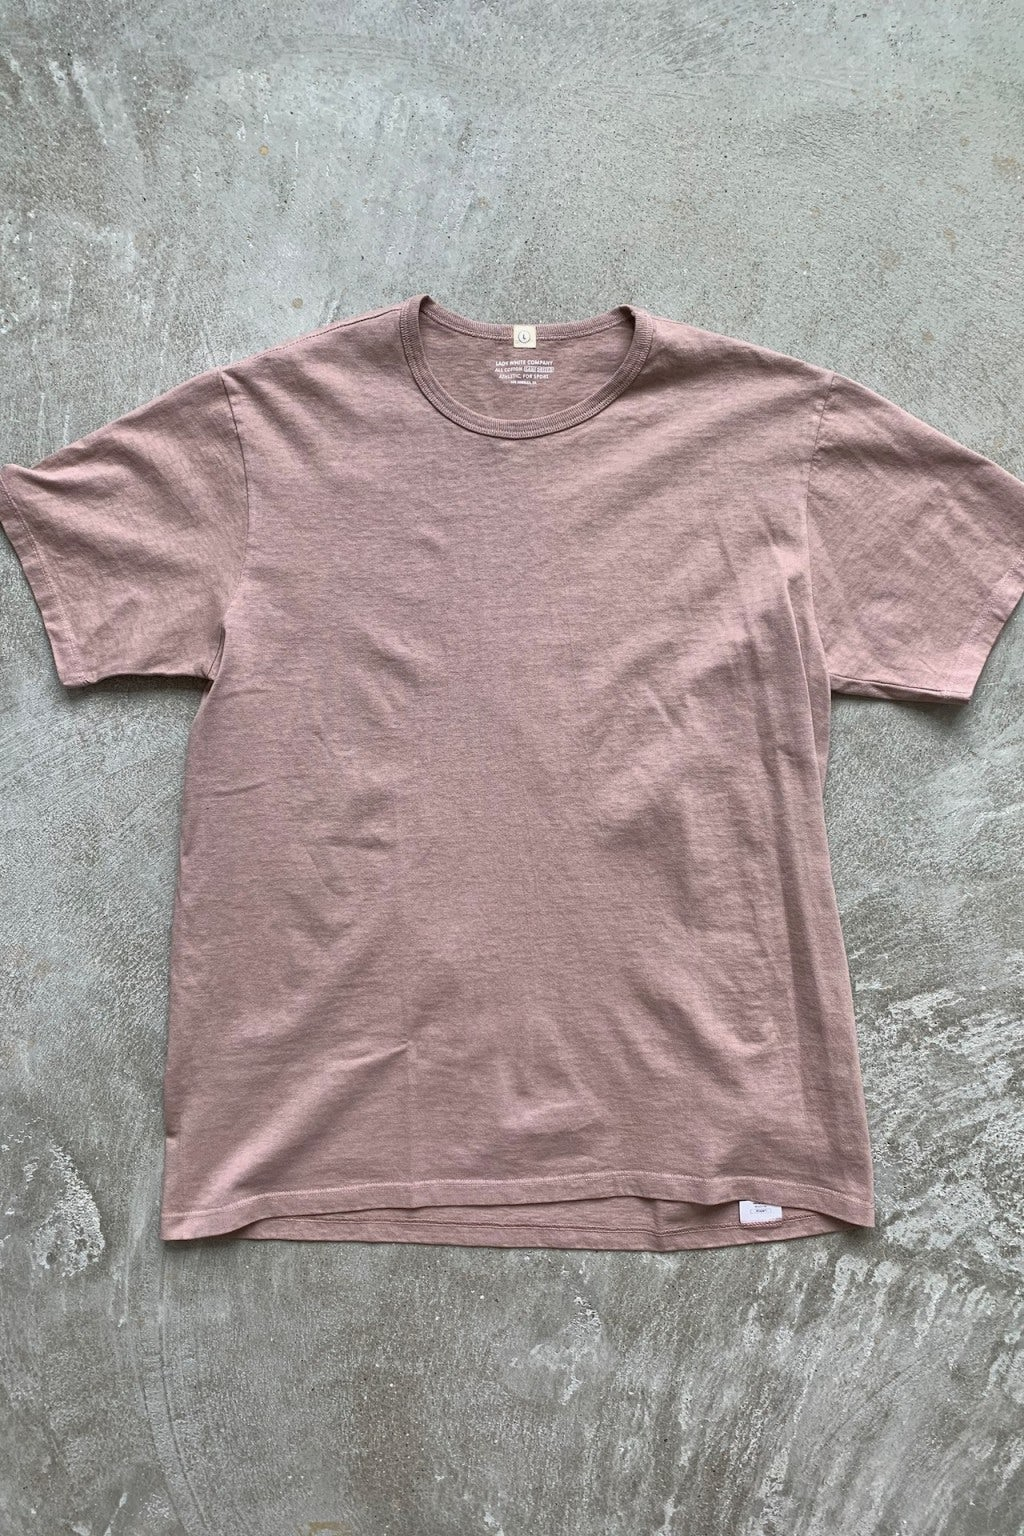 Lady White Co. 101 Single T-Shirt Mauve